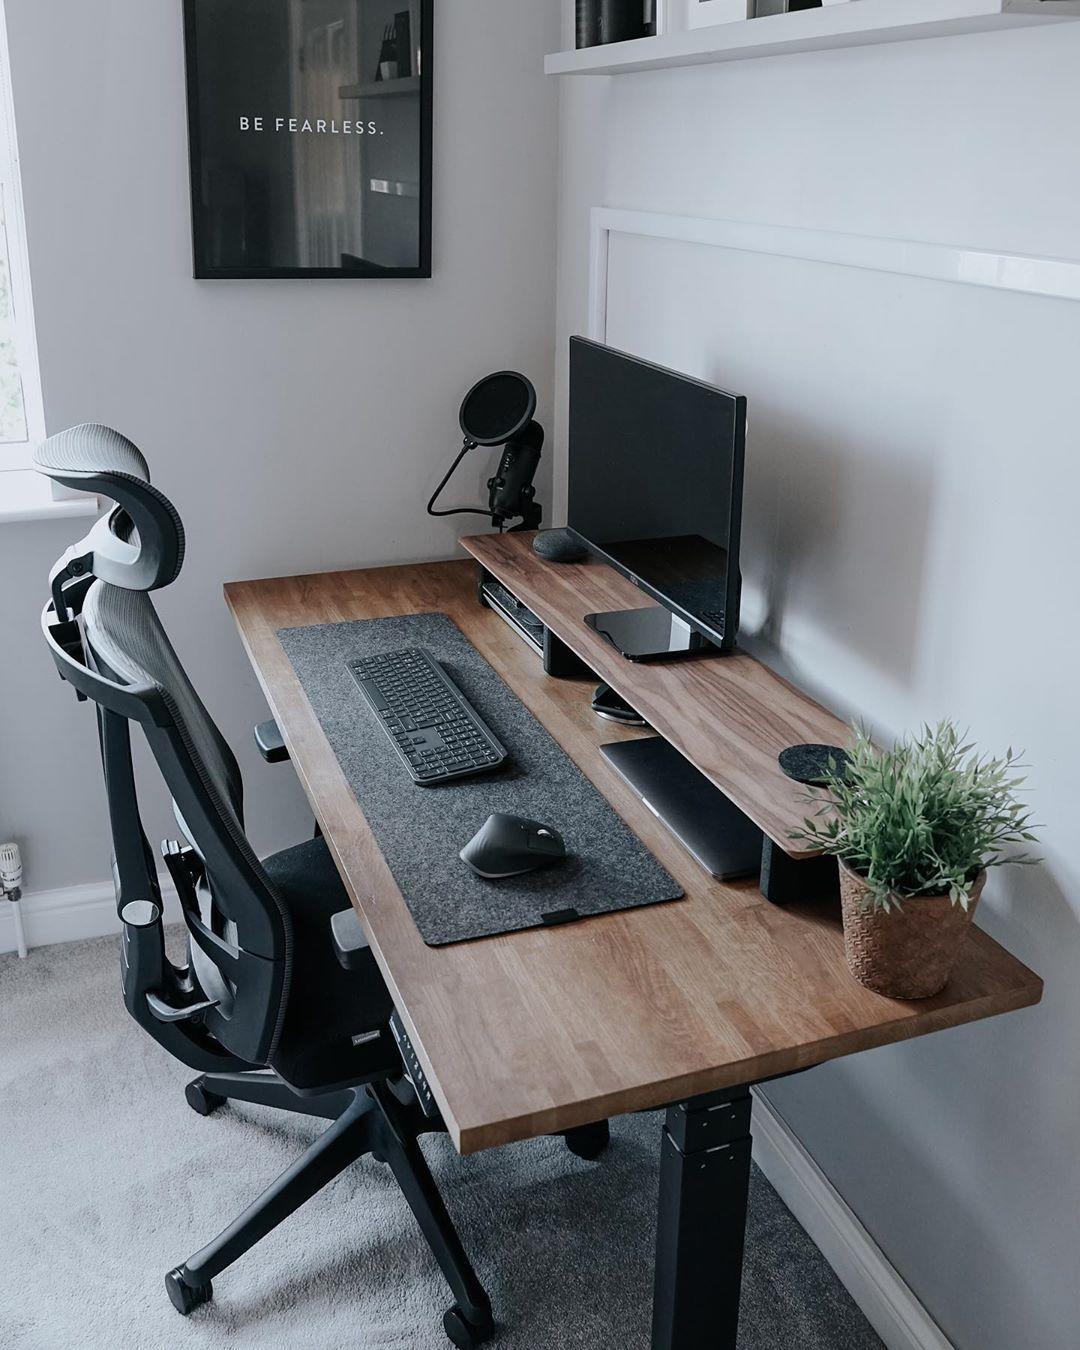 Autonomous Ai Best Standing Desks Ergonomic Office Chairs In 2020 Home Office Design Home Room Design Home Office Setup